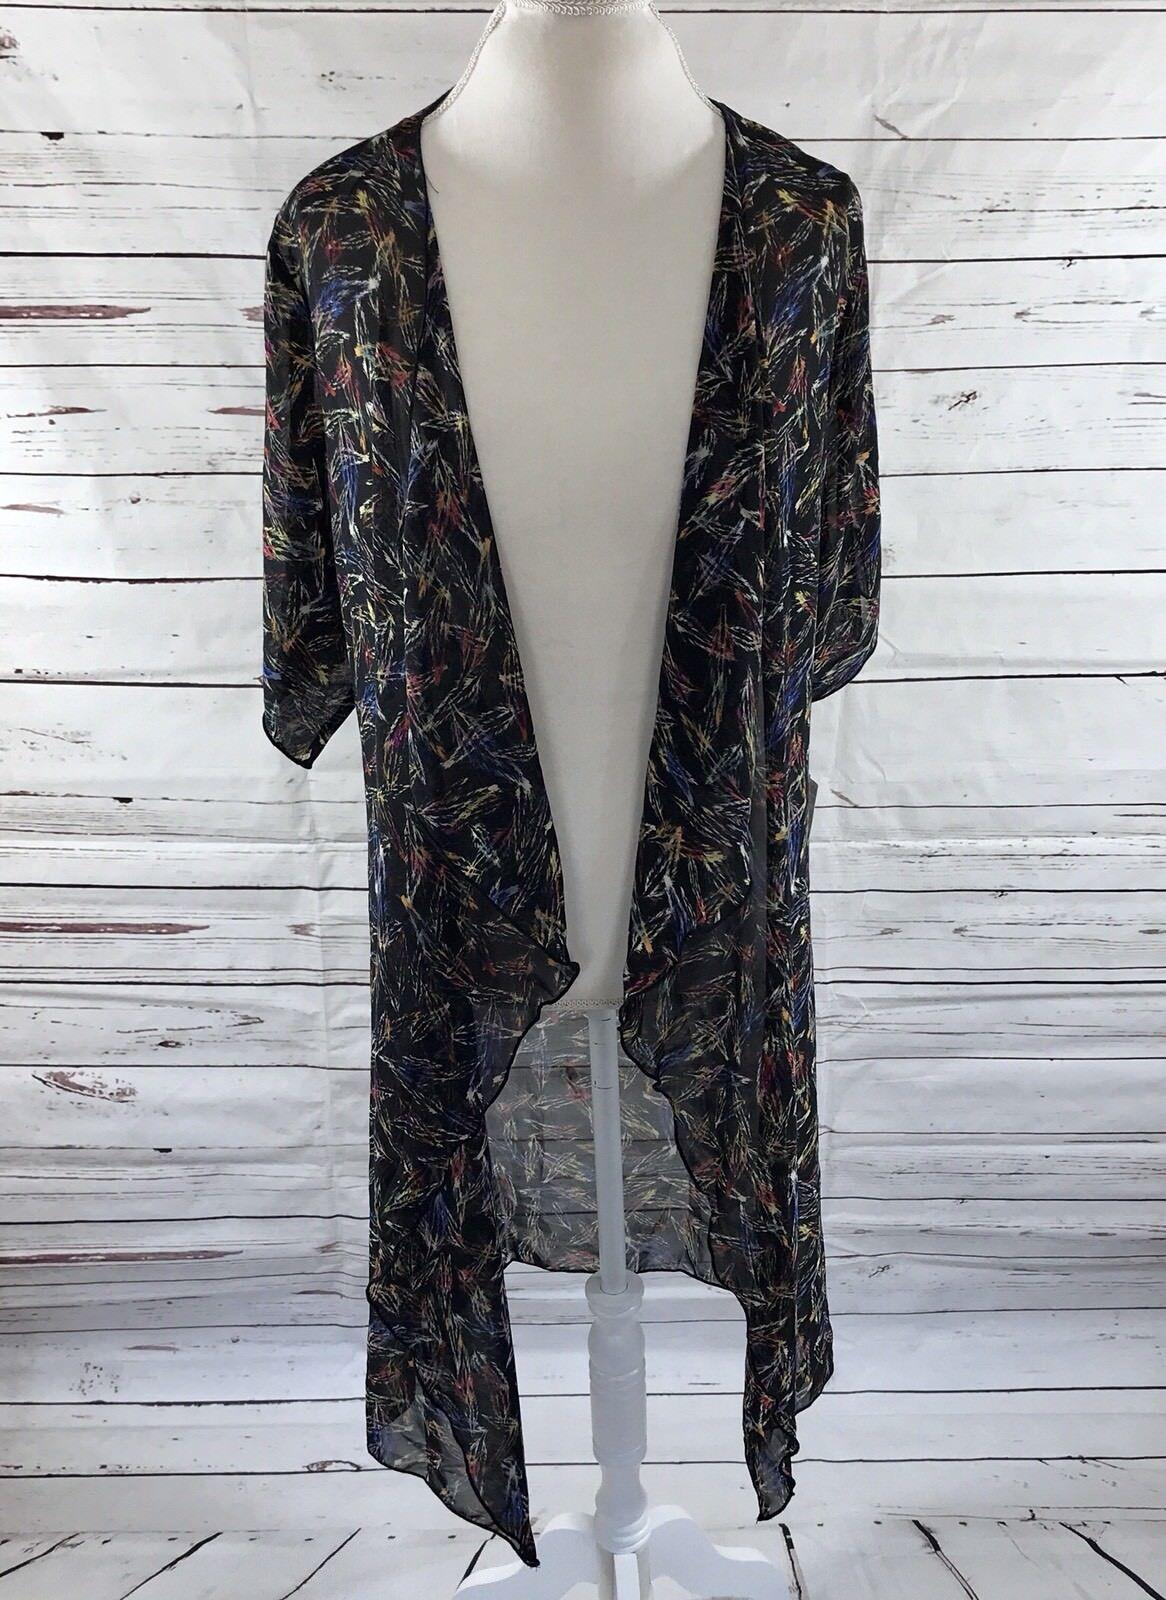 LulaRoe Shirley Kimono schwarz Blau Rosa Gelb Feathers Größe Small